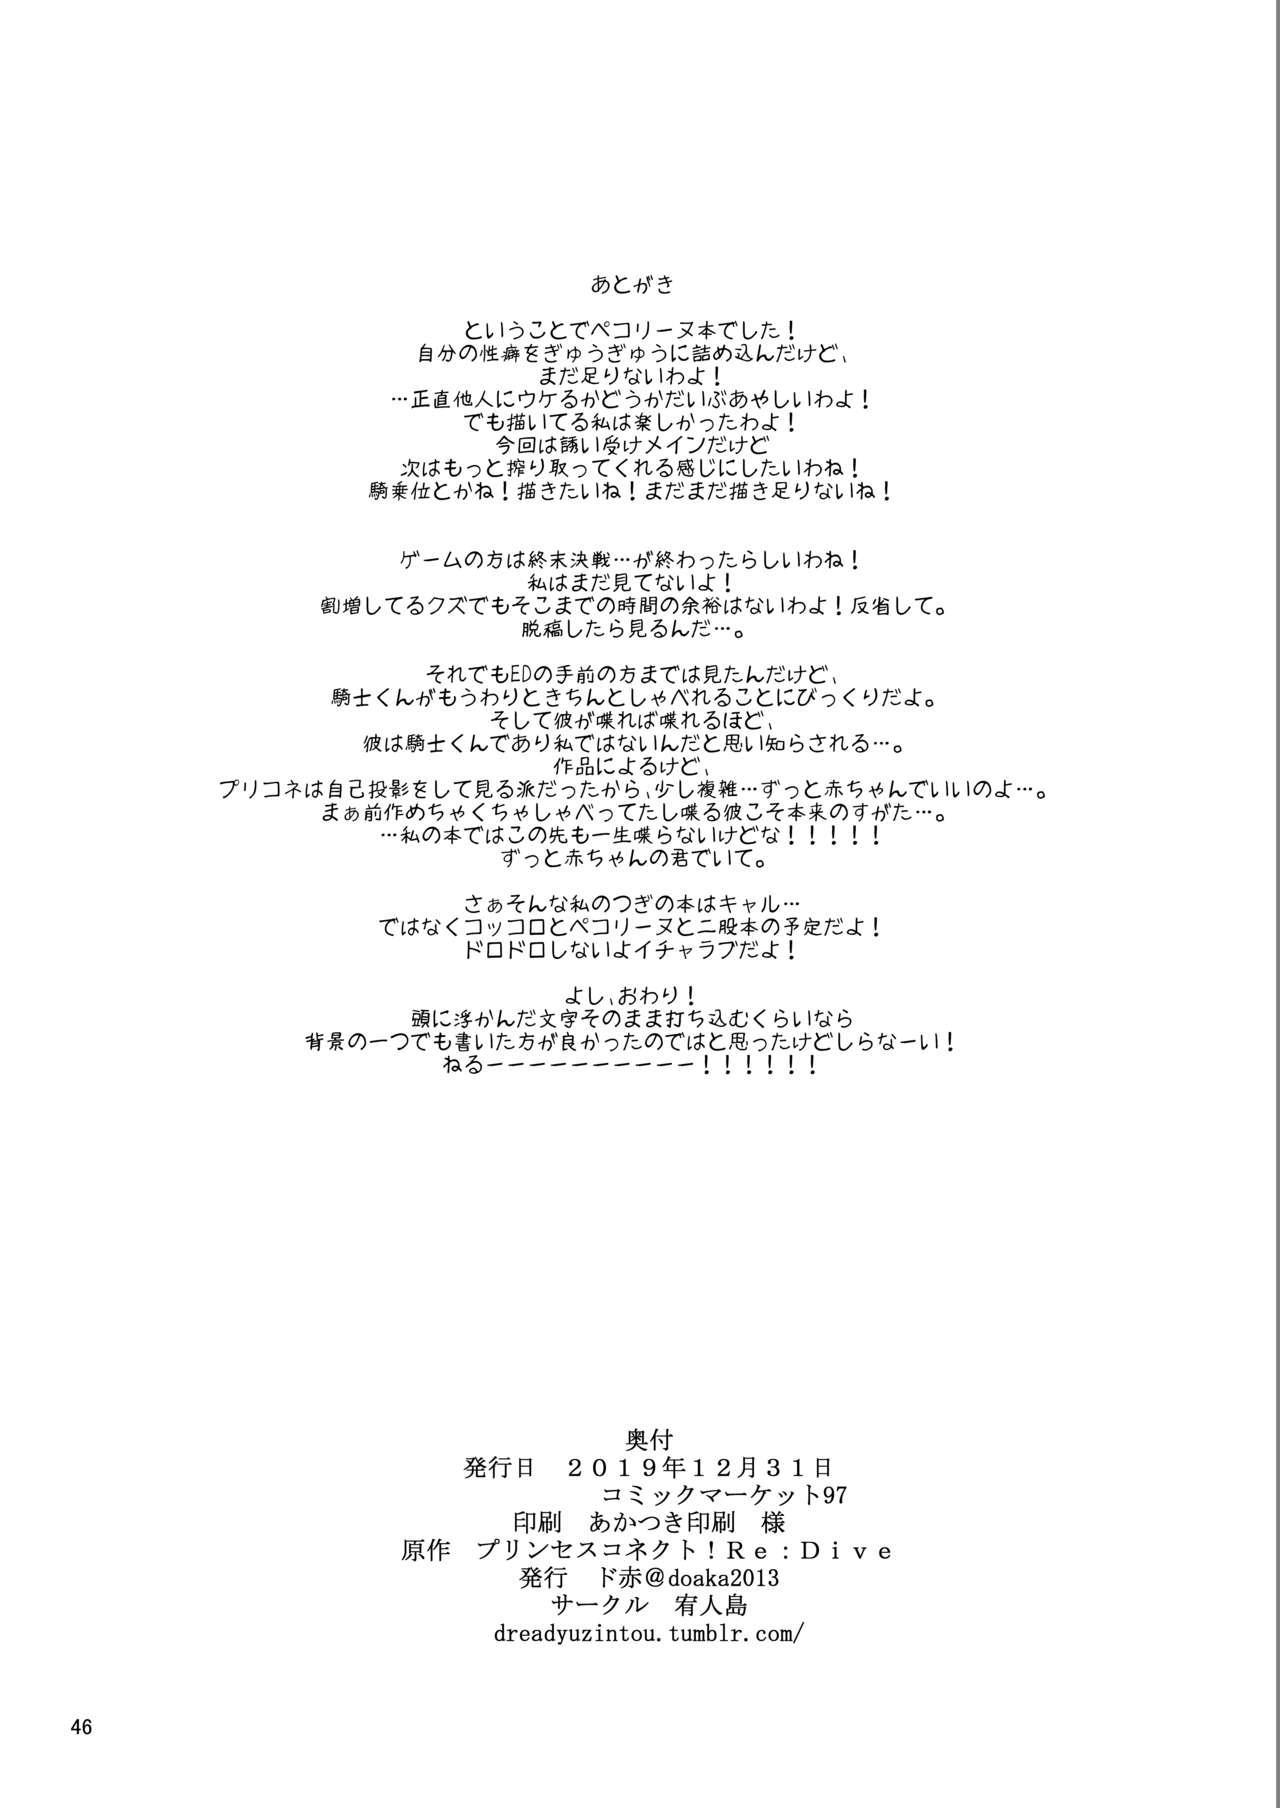 [Yuuzintou (Doaka)] Pecorine to Uwaki Ecchi! ~Bishokuden to Harem Ecchi!~ 2 (Princess Connect! Re:Dive) [Digital] 44